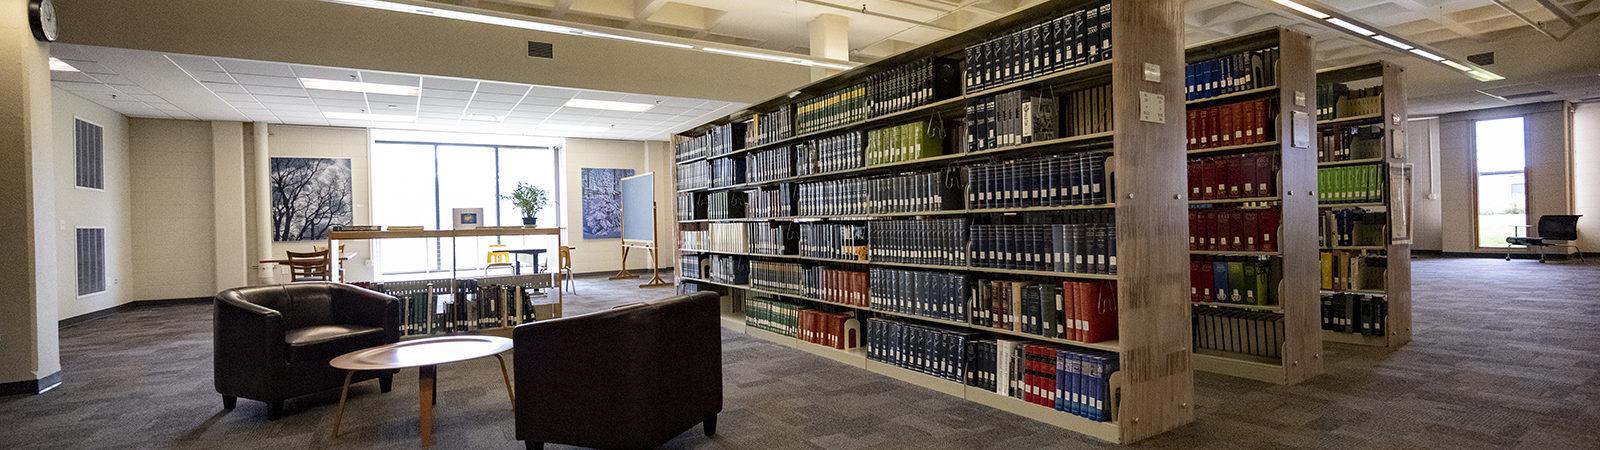 Northland College Dexter Library Interior